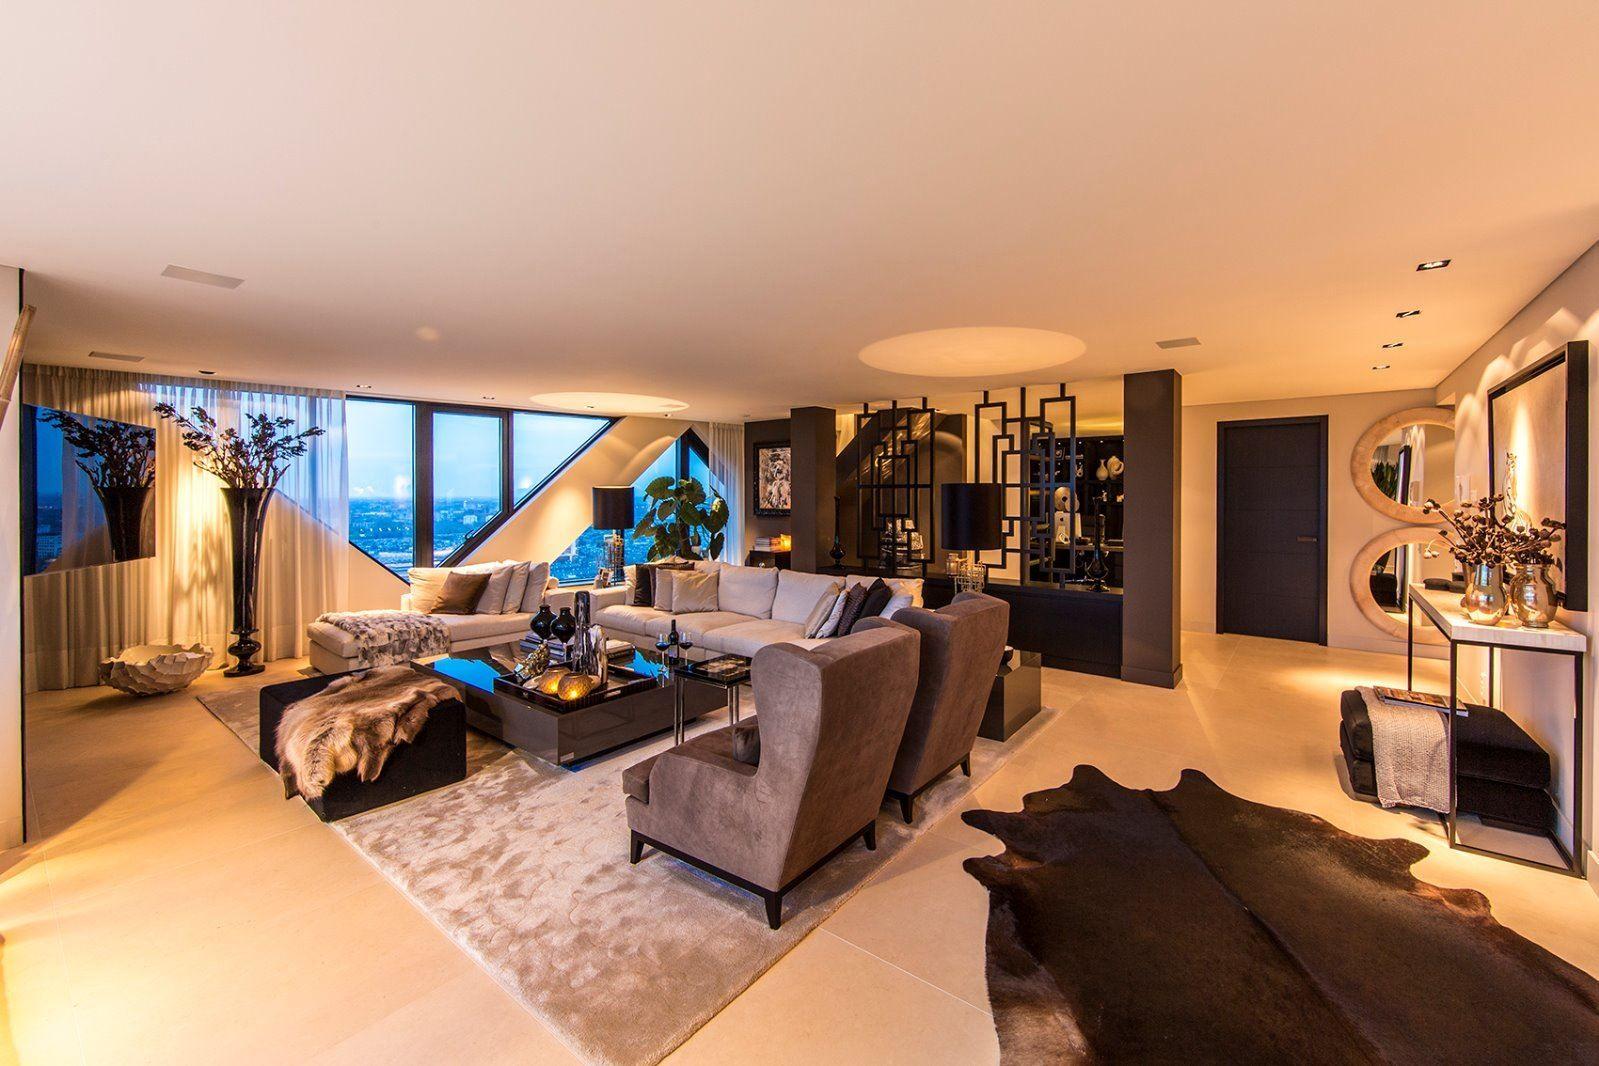 Spectaculair eric kuster penthouse van ca. 330 m² met riant